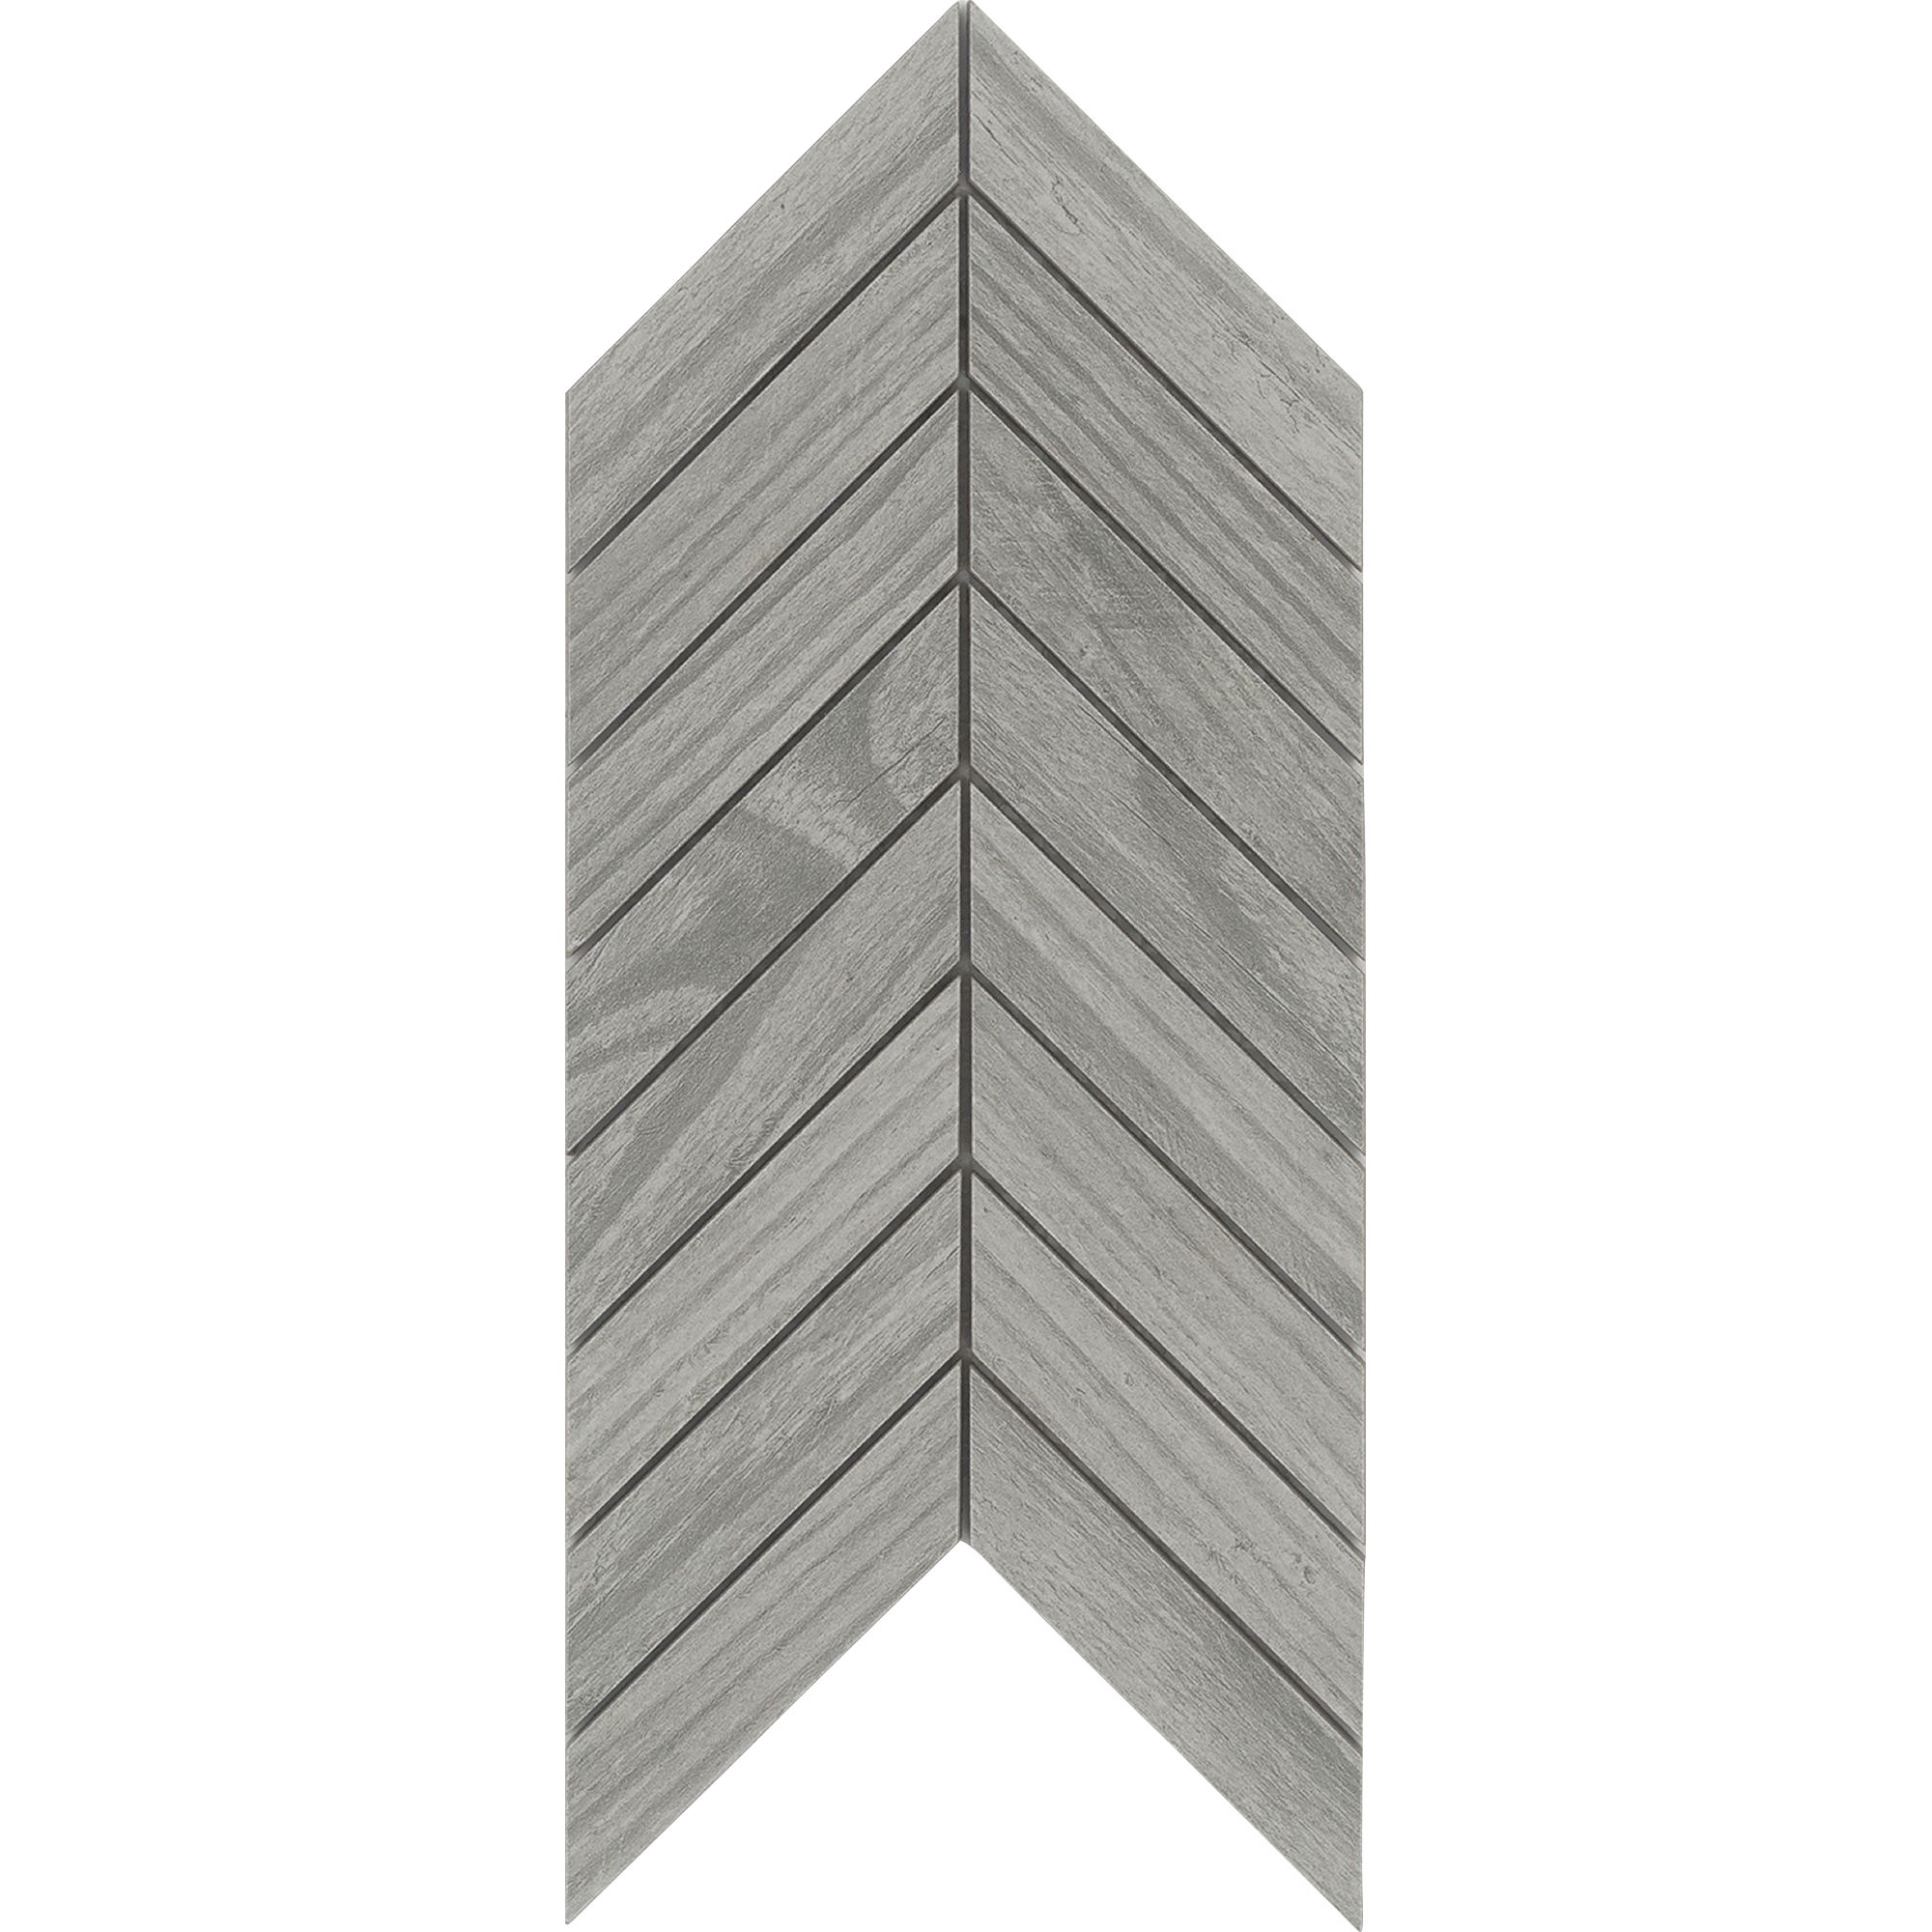 chevron mosaic grey matt wood effect porcelain wall floor tile l 300mm w 155mm